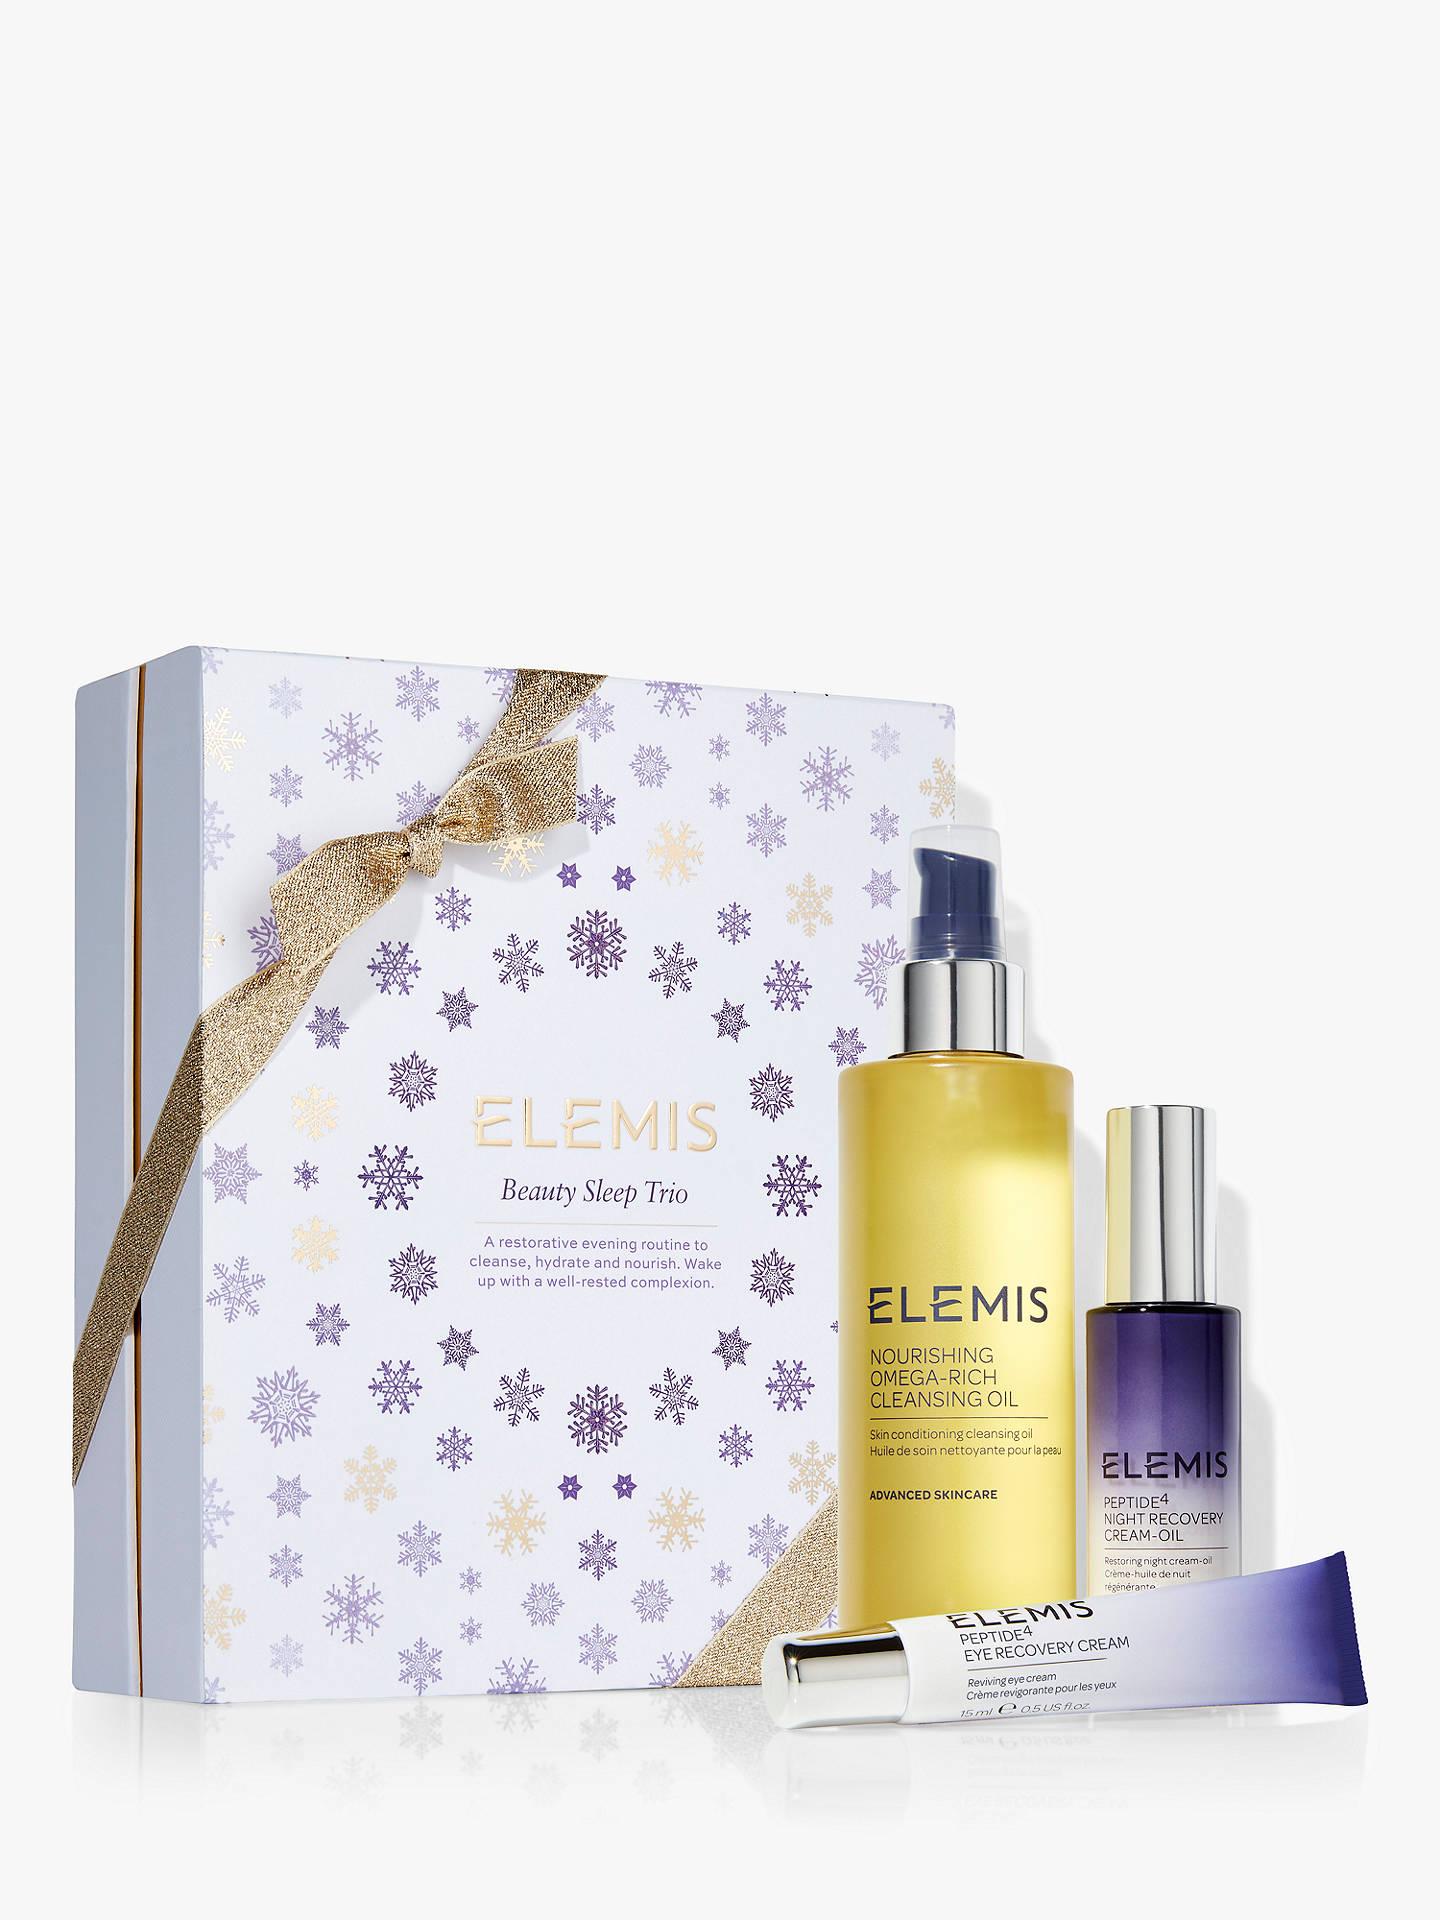 BuyElemis Beauty Sleep Trio Skincare Gift Set Online at johnlewis.com